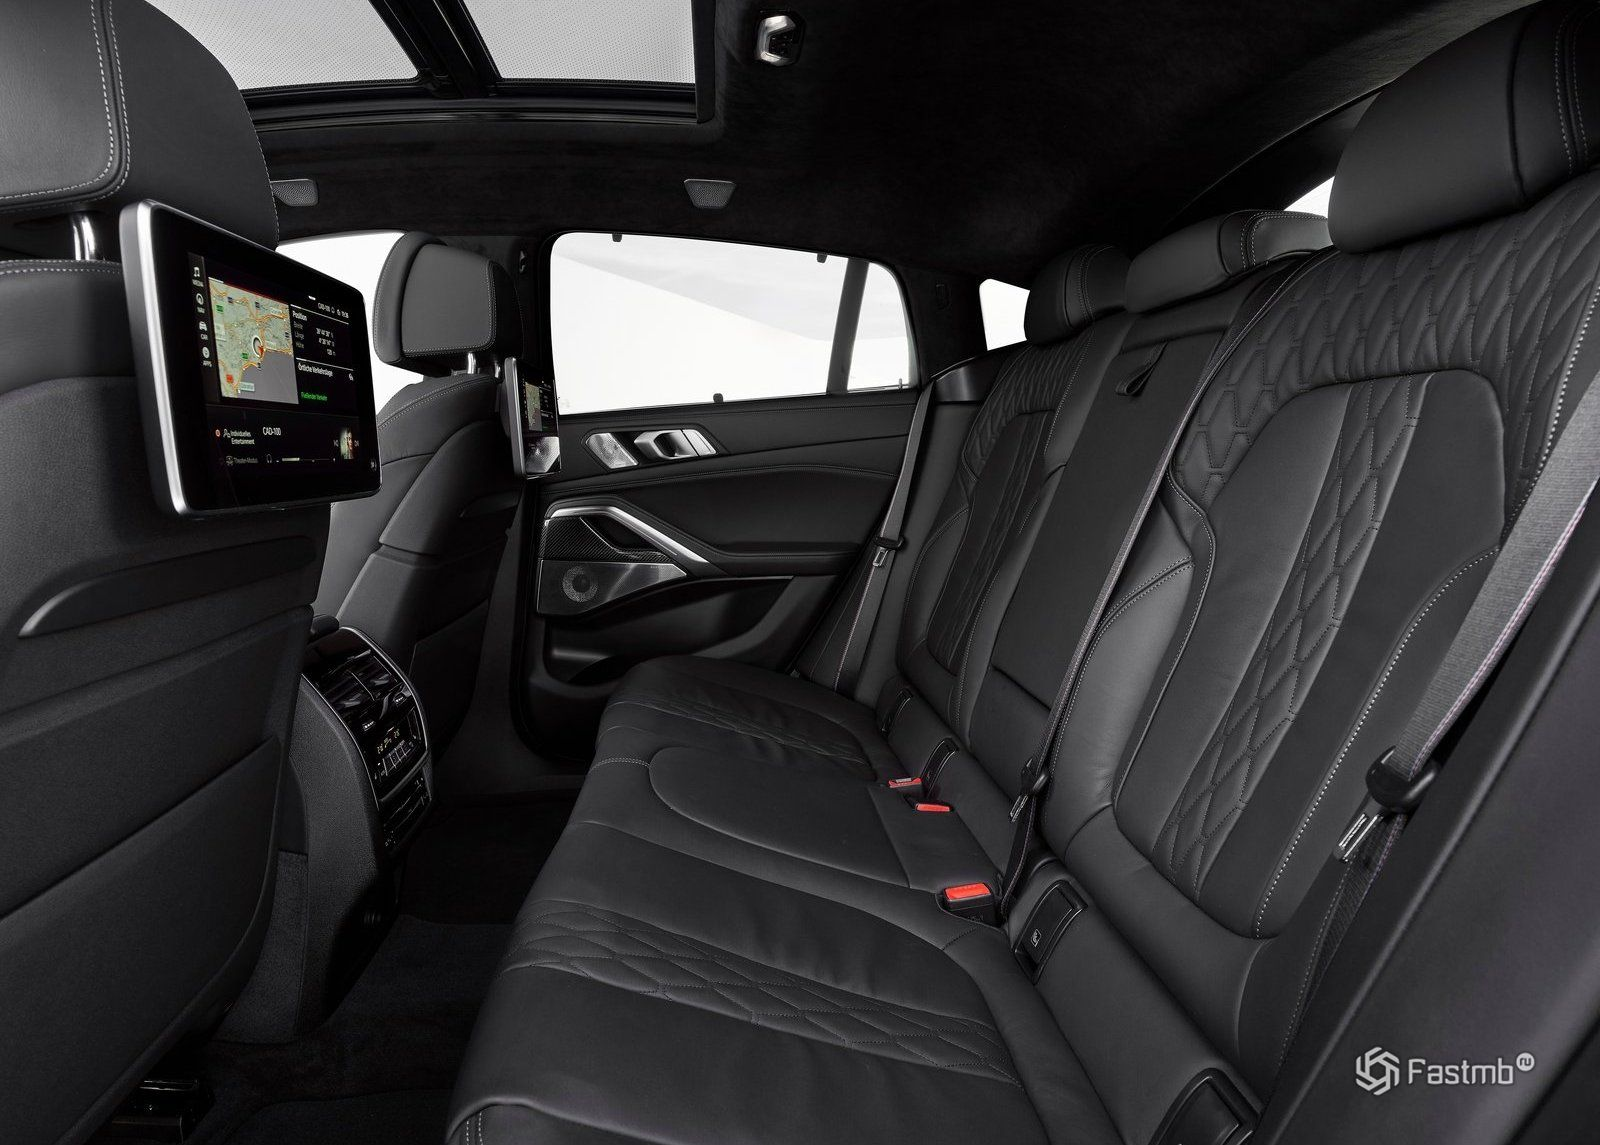 БМВ Х6 G06 2019-2020: характеристики, цена, фото и видео-обзор